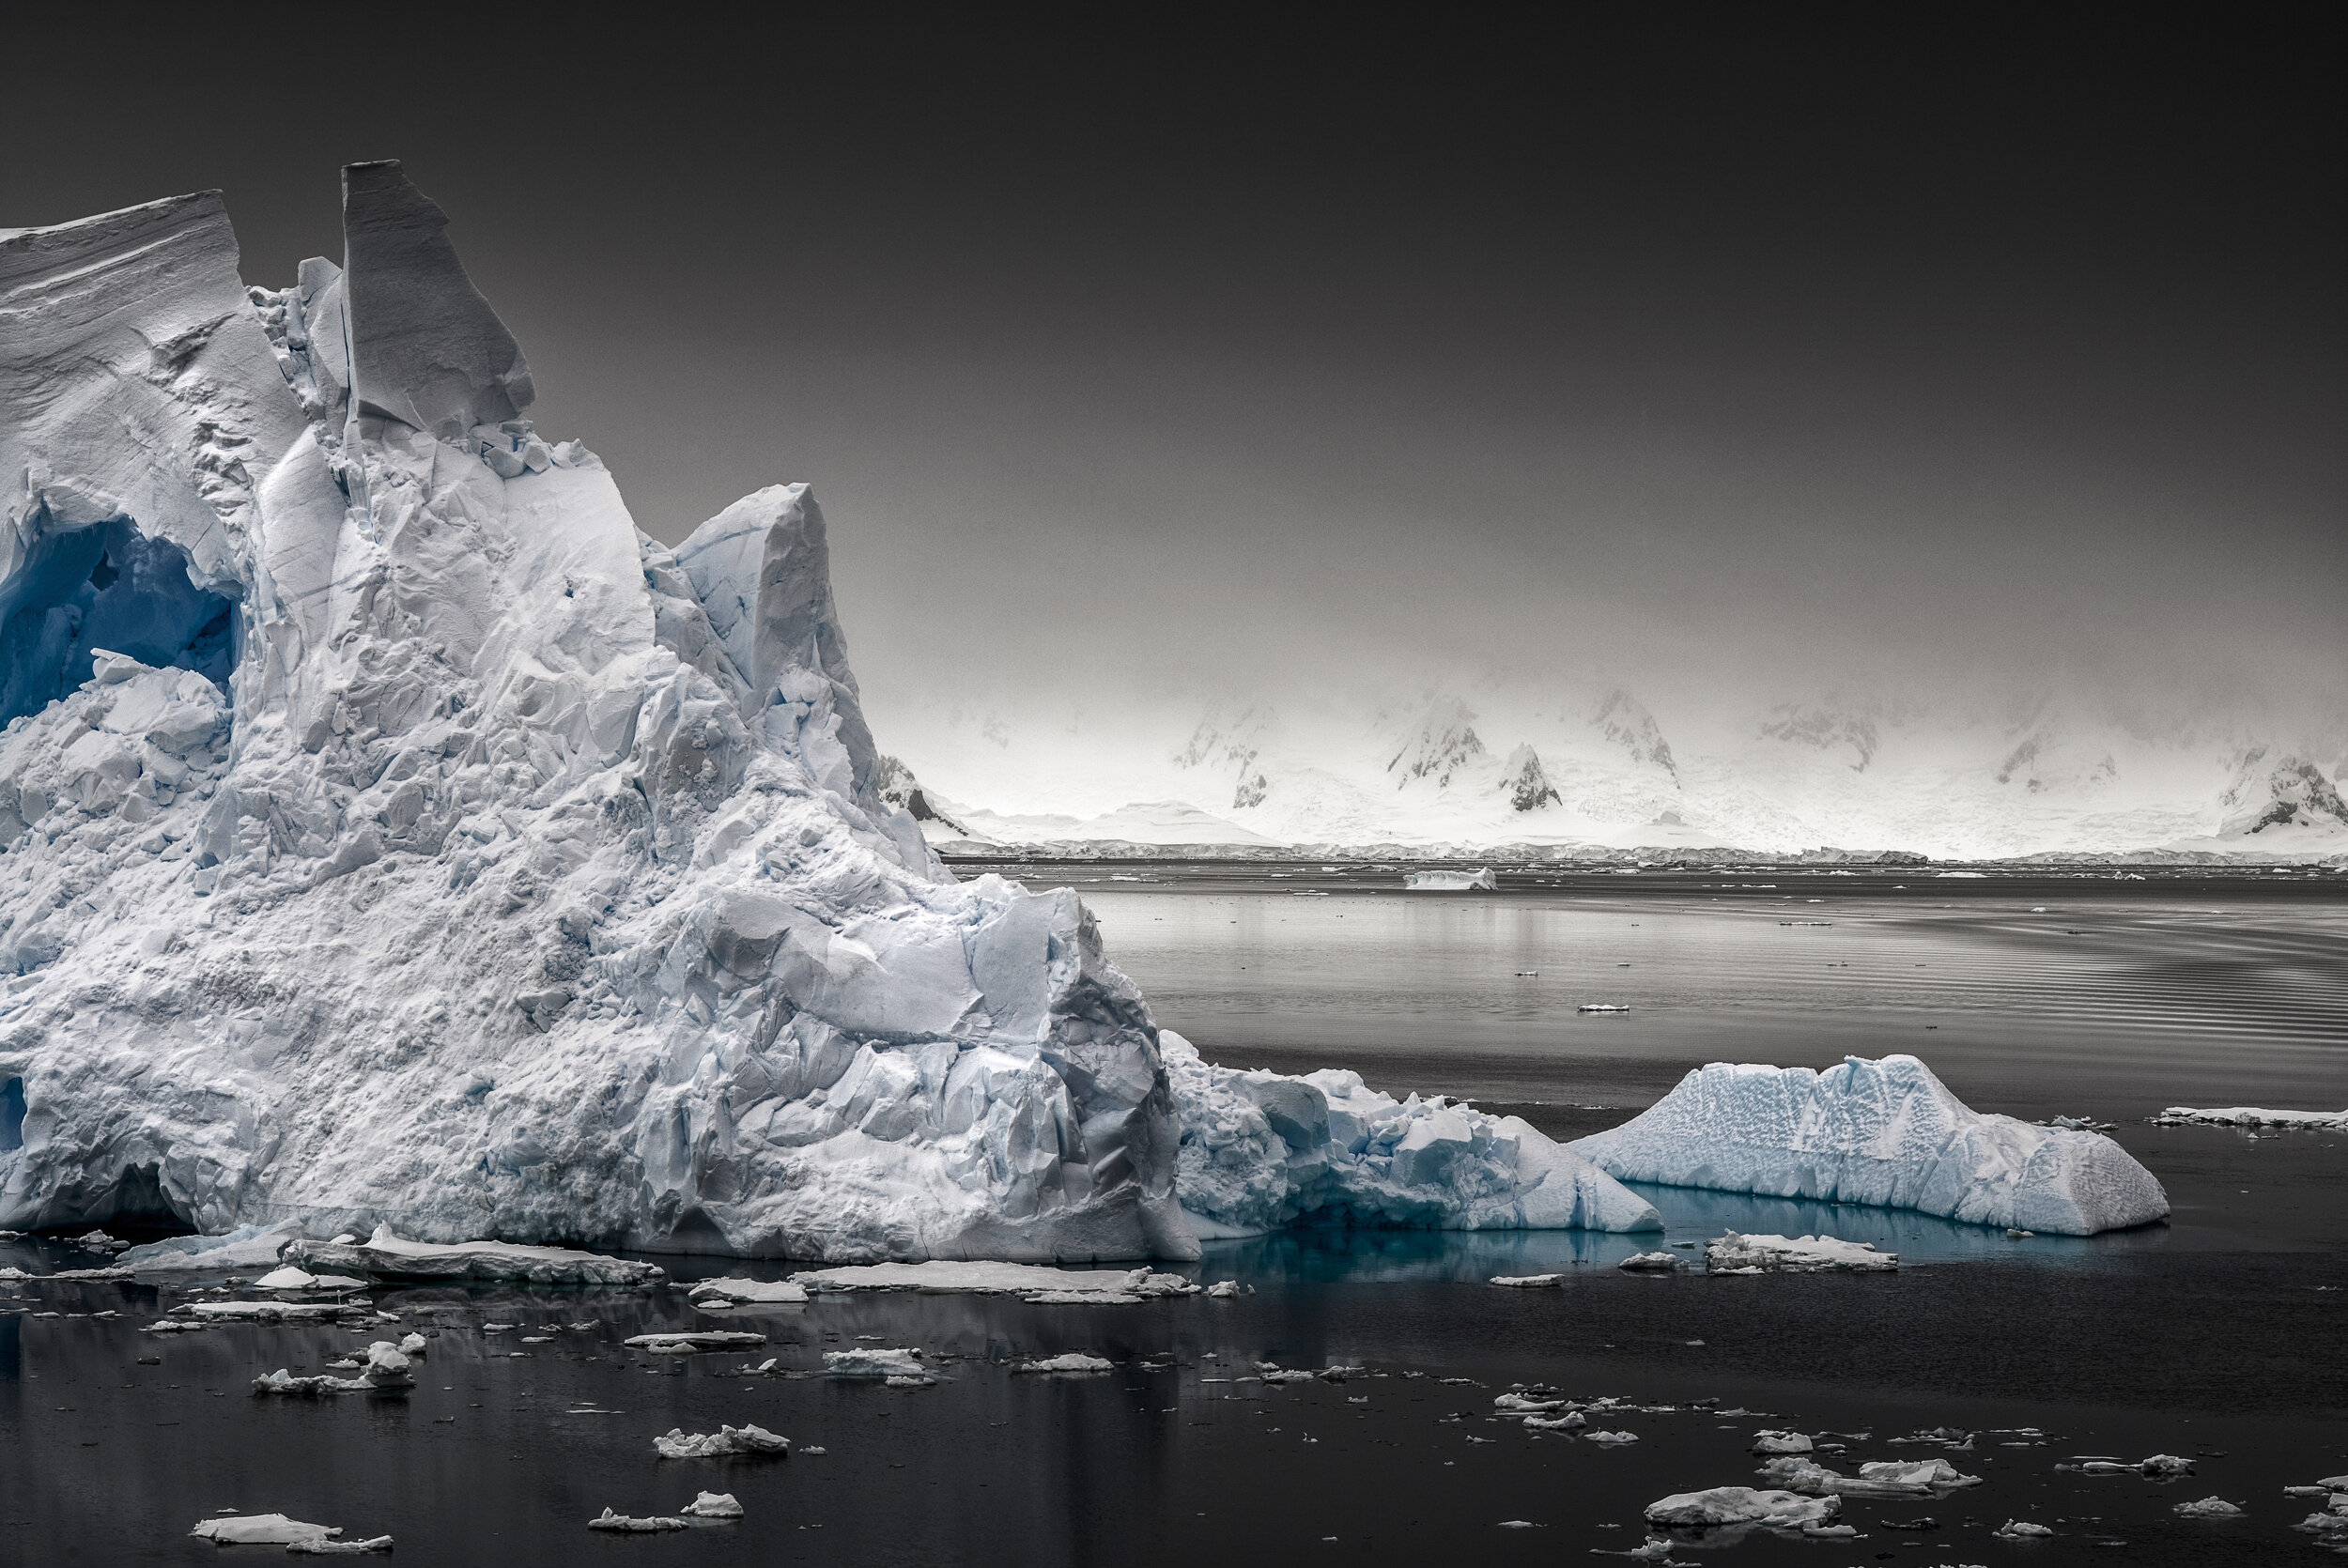 manuel_uebler_antarctica_twilight_009.jpg